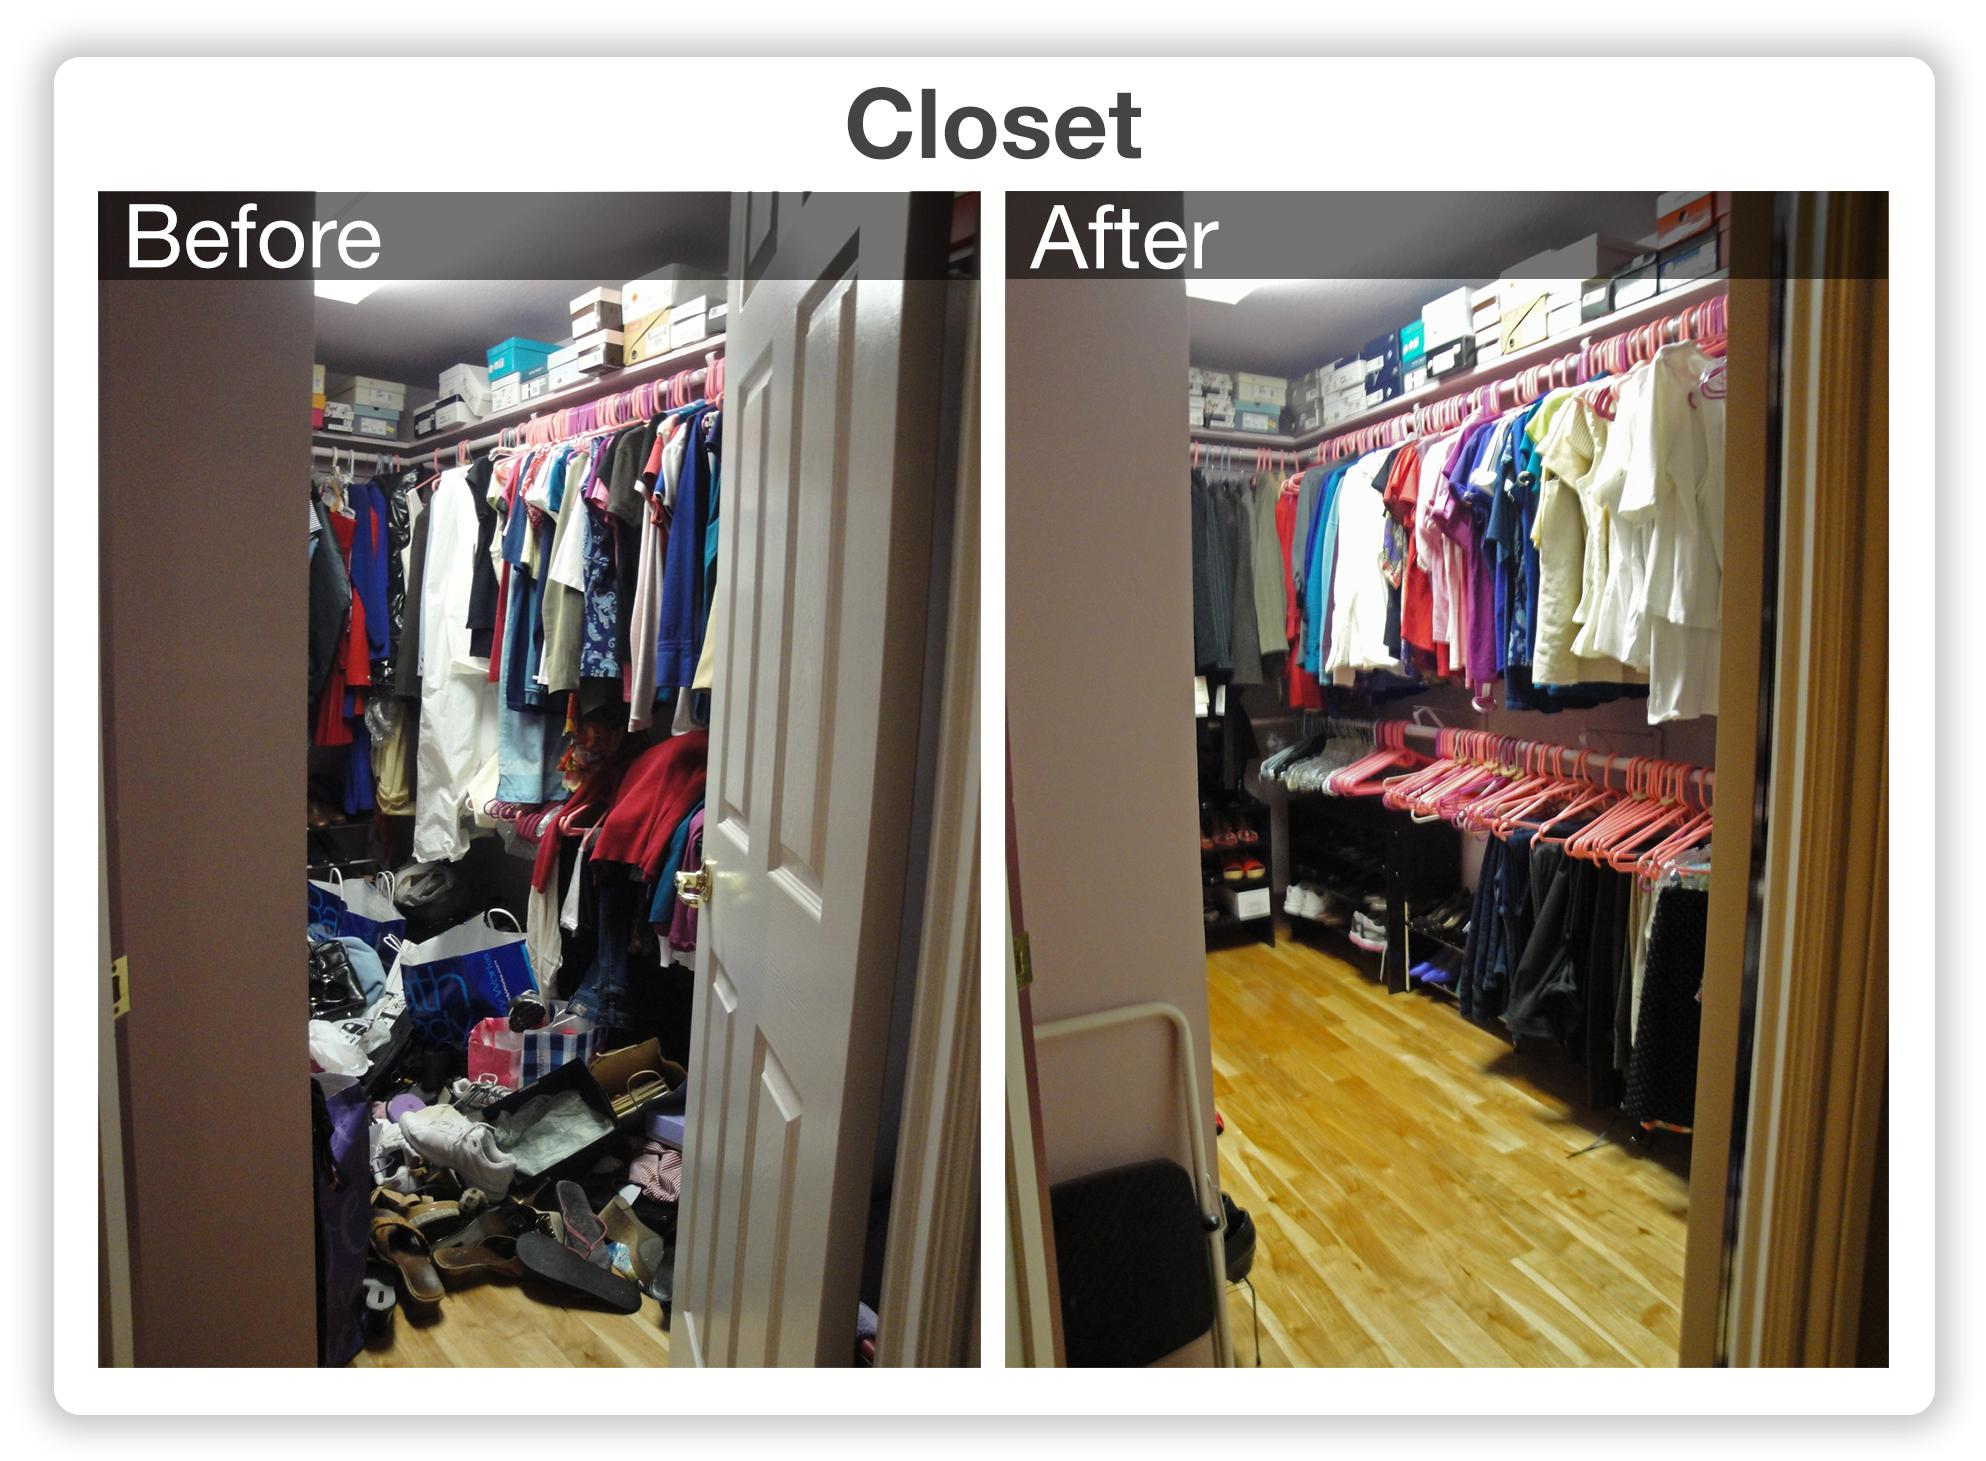 organized_by_choice_closet.jpg